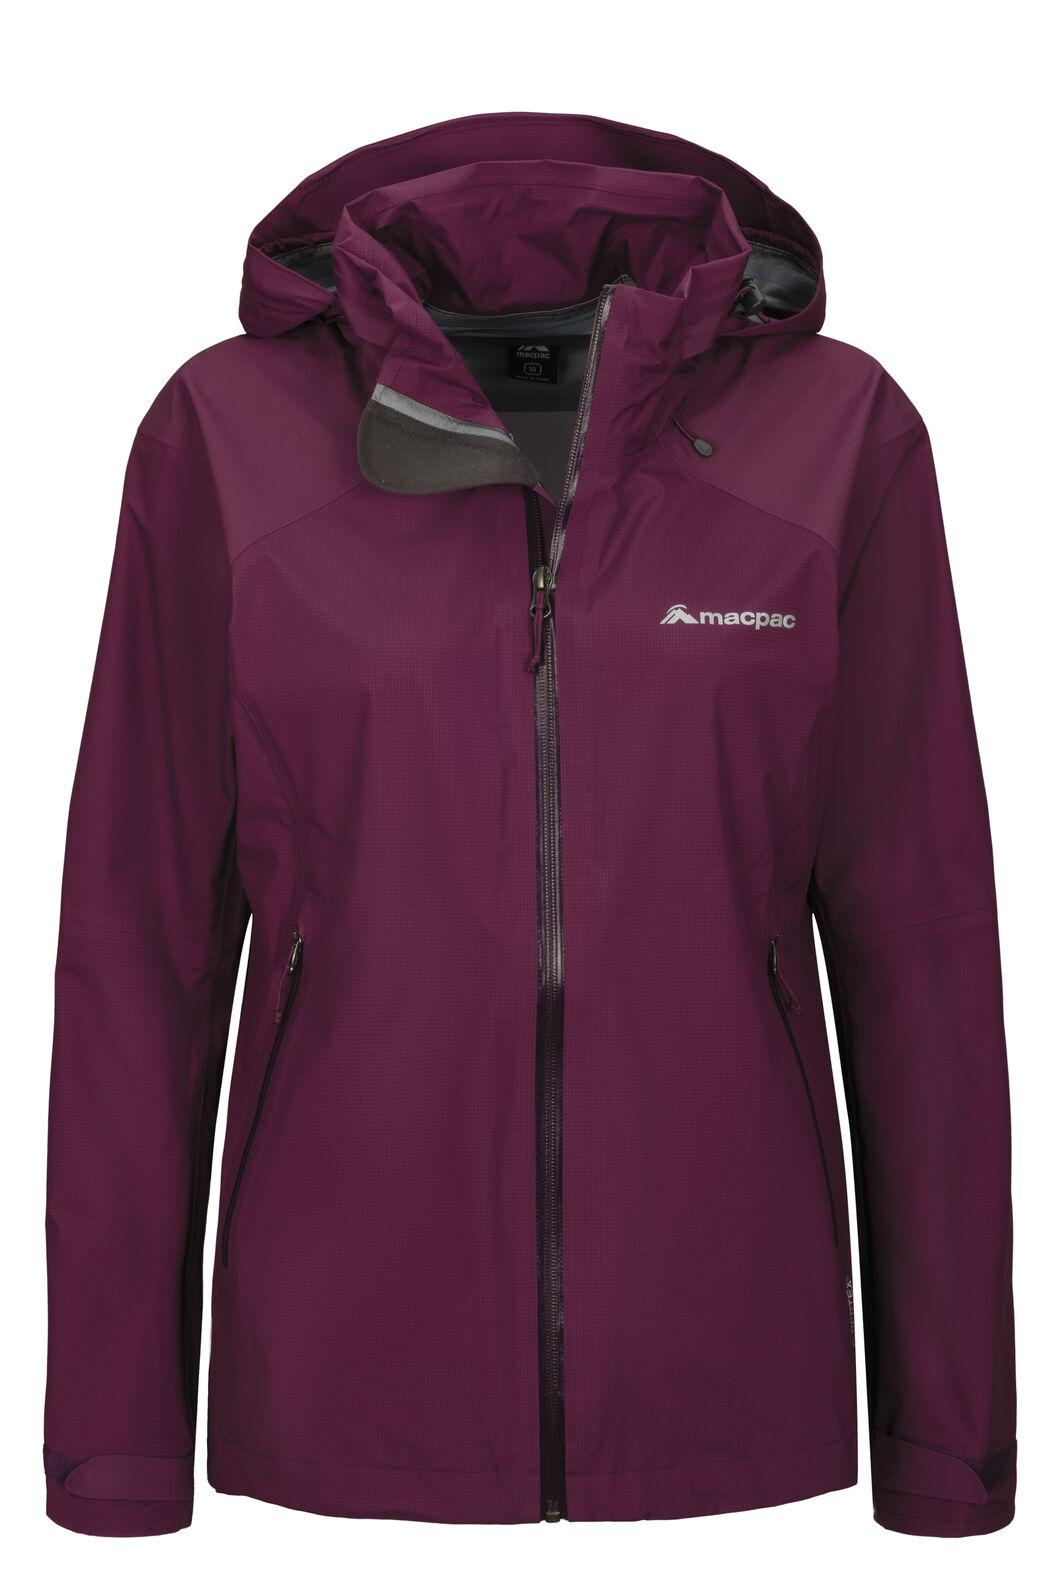 Macpac Women's Traverse Pertex® Rain Jacket, Amaranth, hi-res